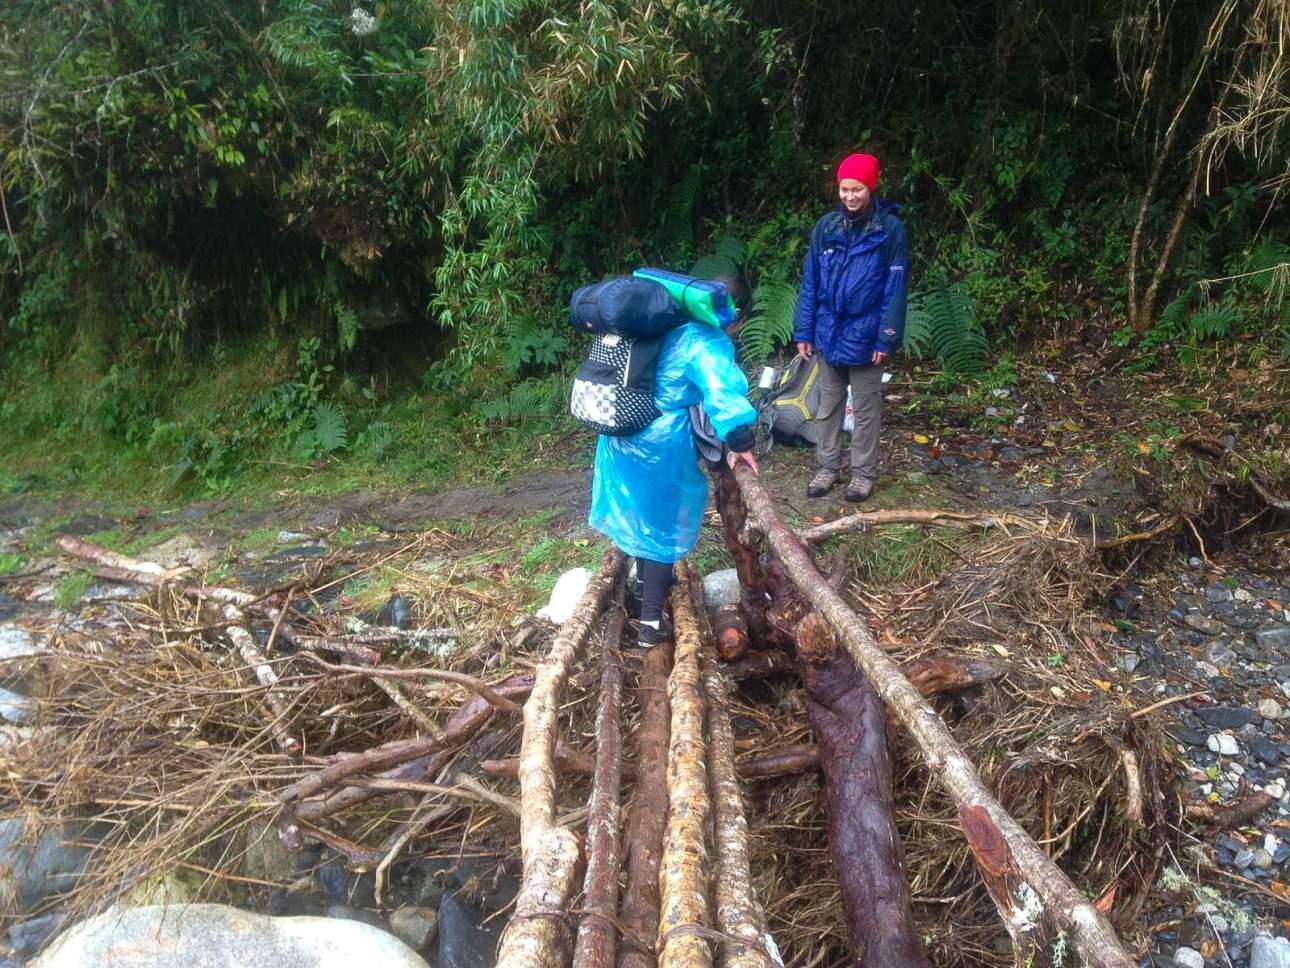 Переход реки по деревнныи брусьям